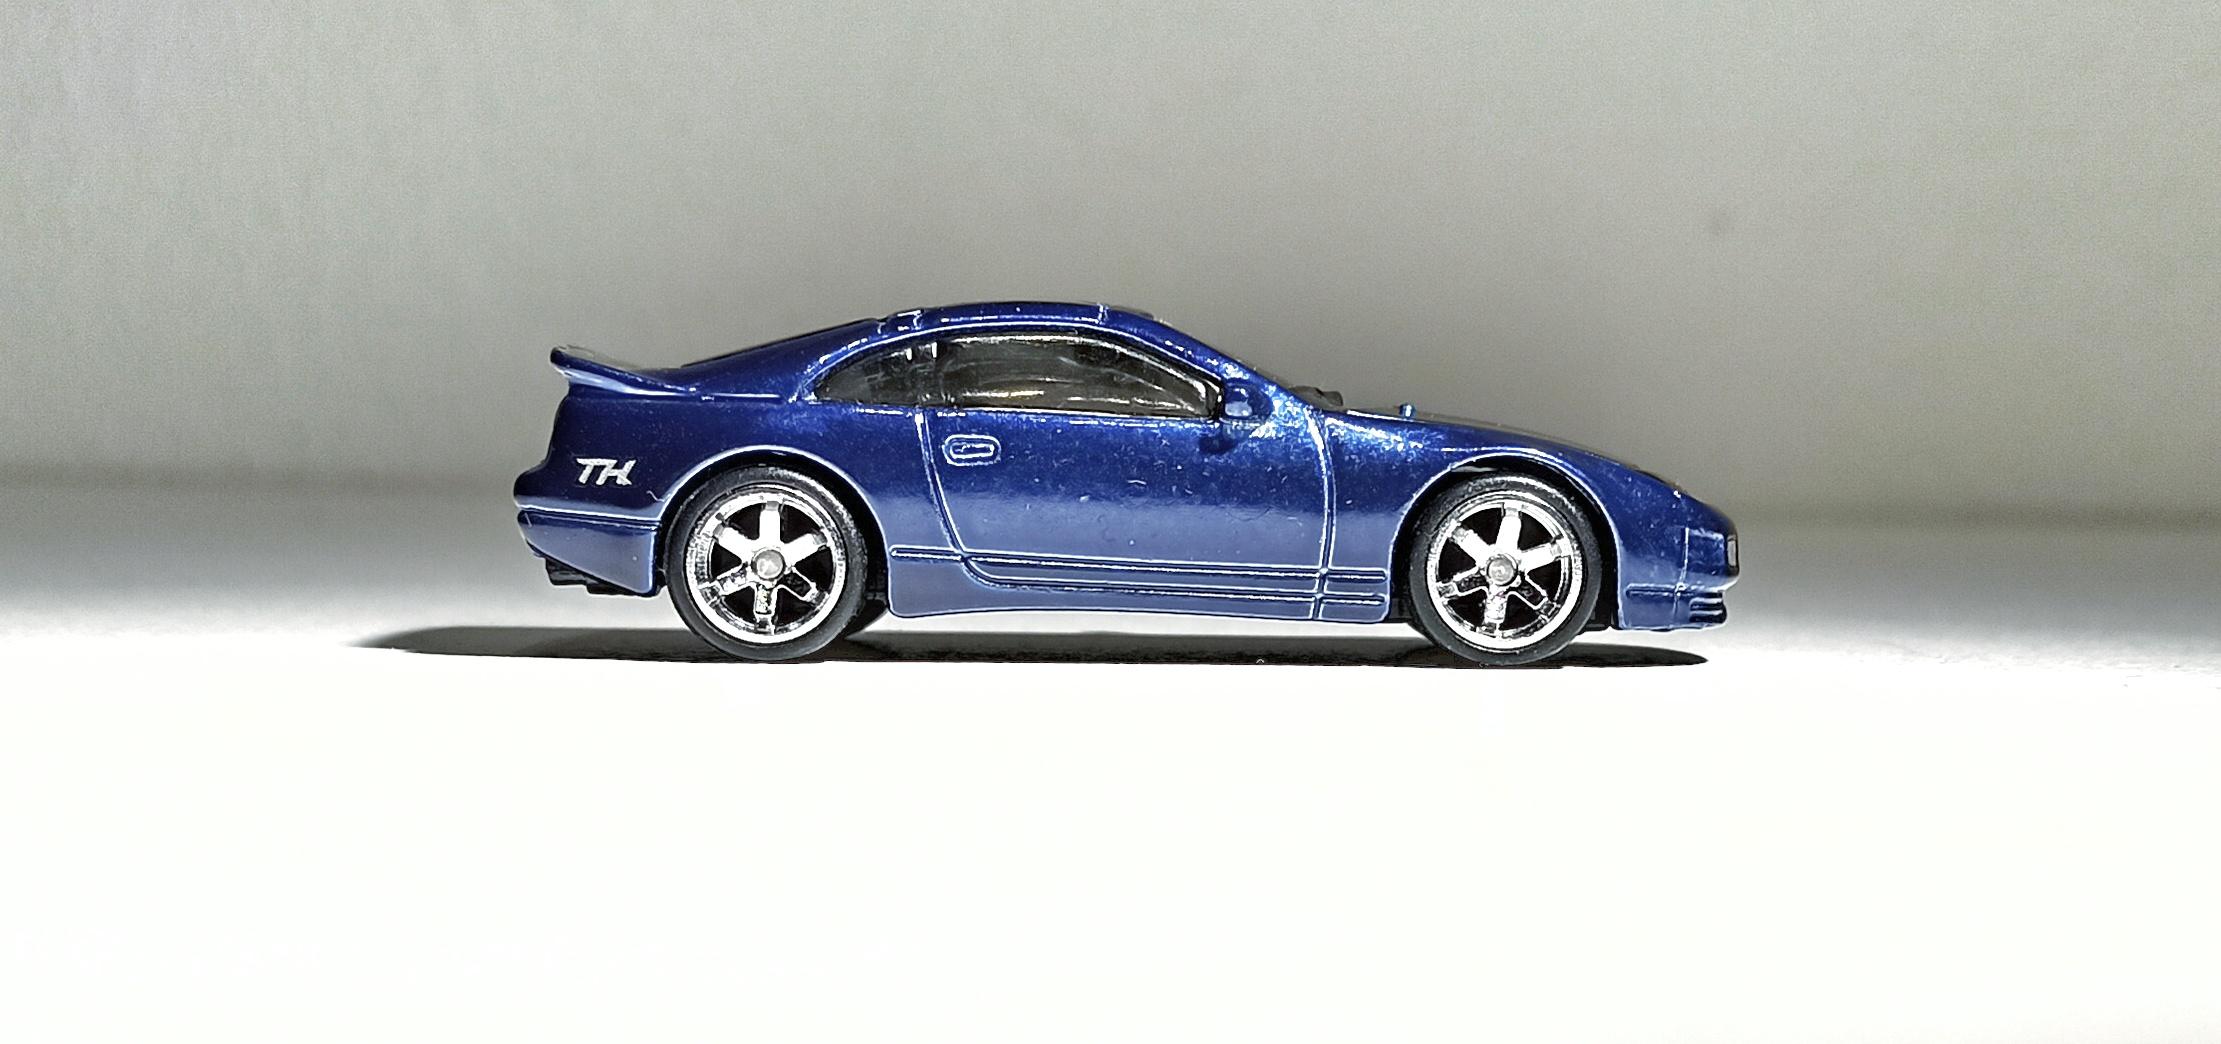 Hot Wheels Nissan 300ZX Twin Turbo (GTD10) 2021 (23/250) HW Turbo (1/5) spectraflame blue Super Treasure Hunt (STH) side view